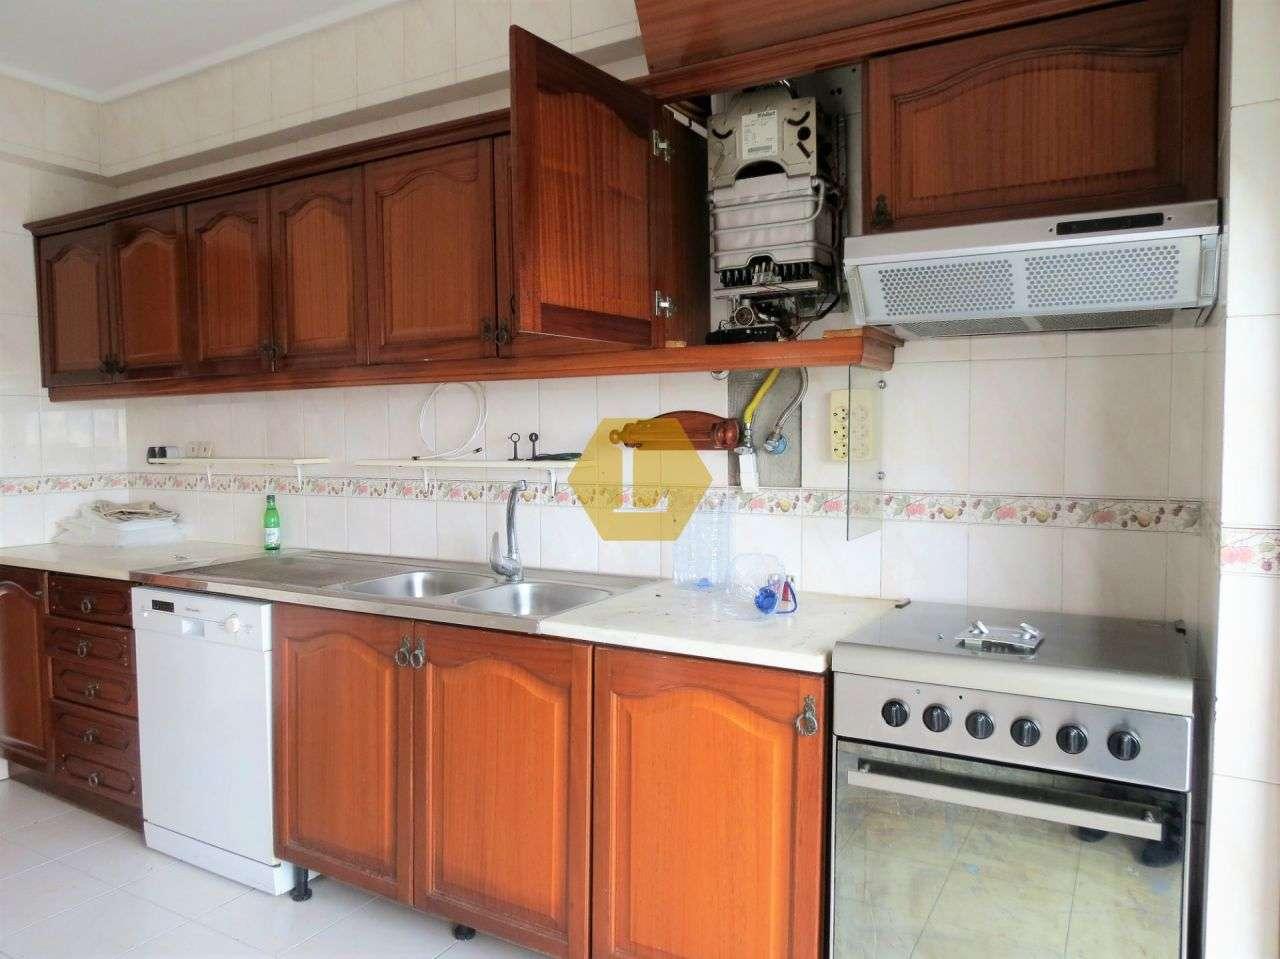 Apartamento para comprar, Gafanha da Nazaré, Aveiro - Foto 19